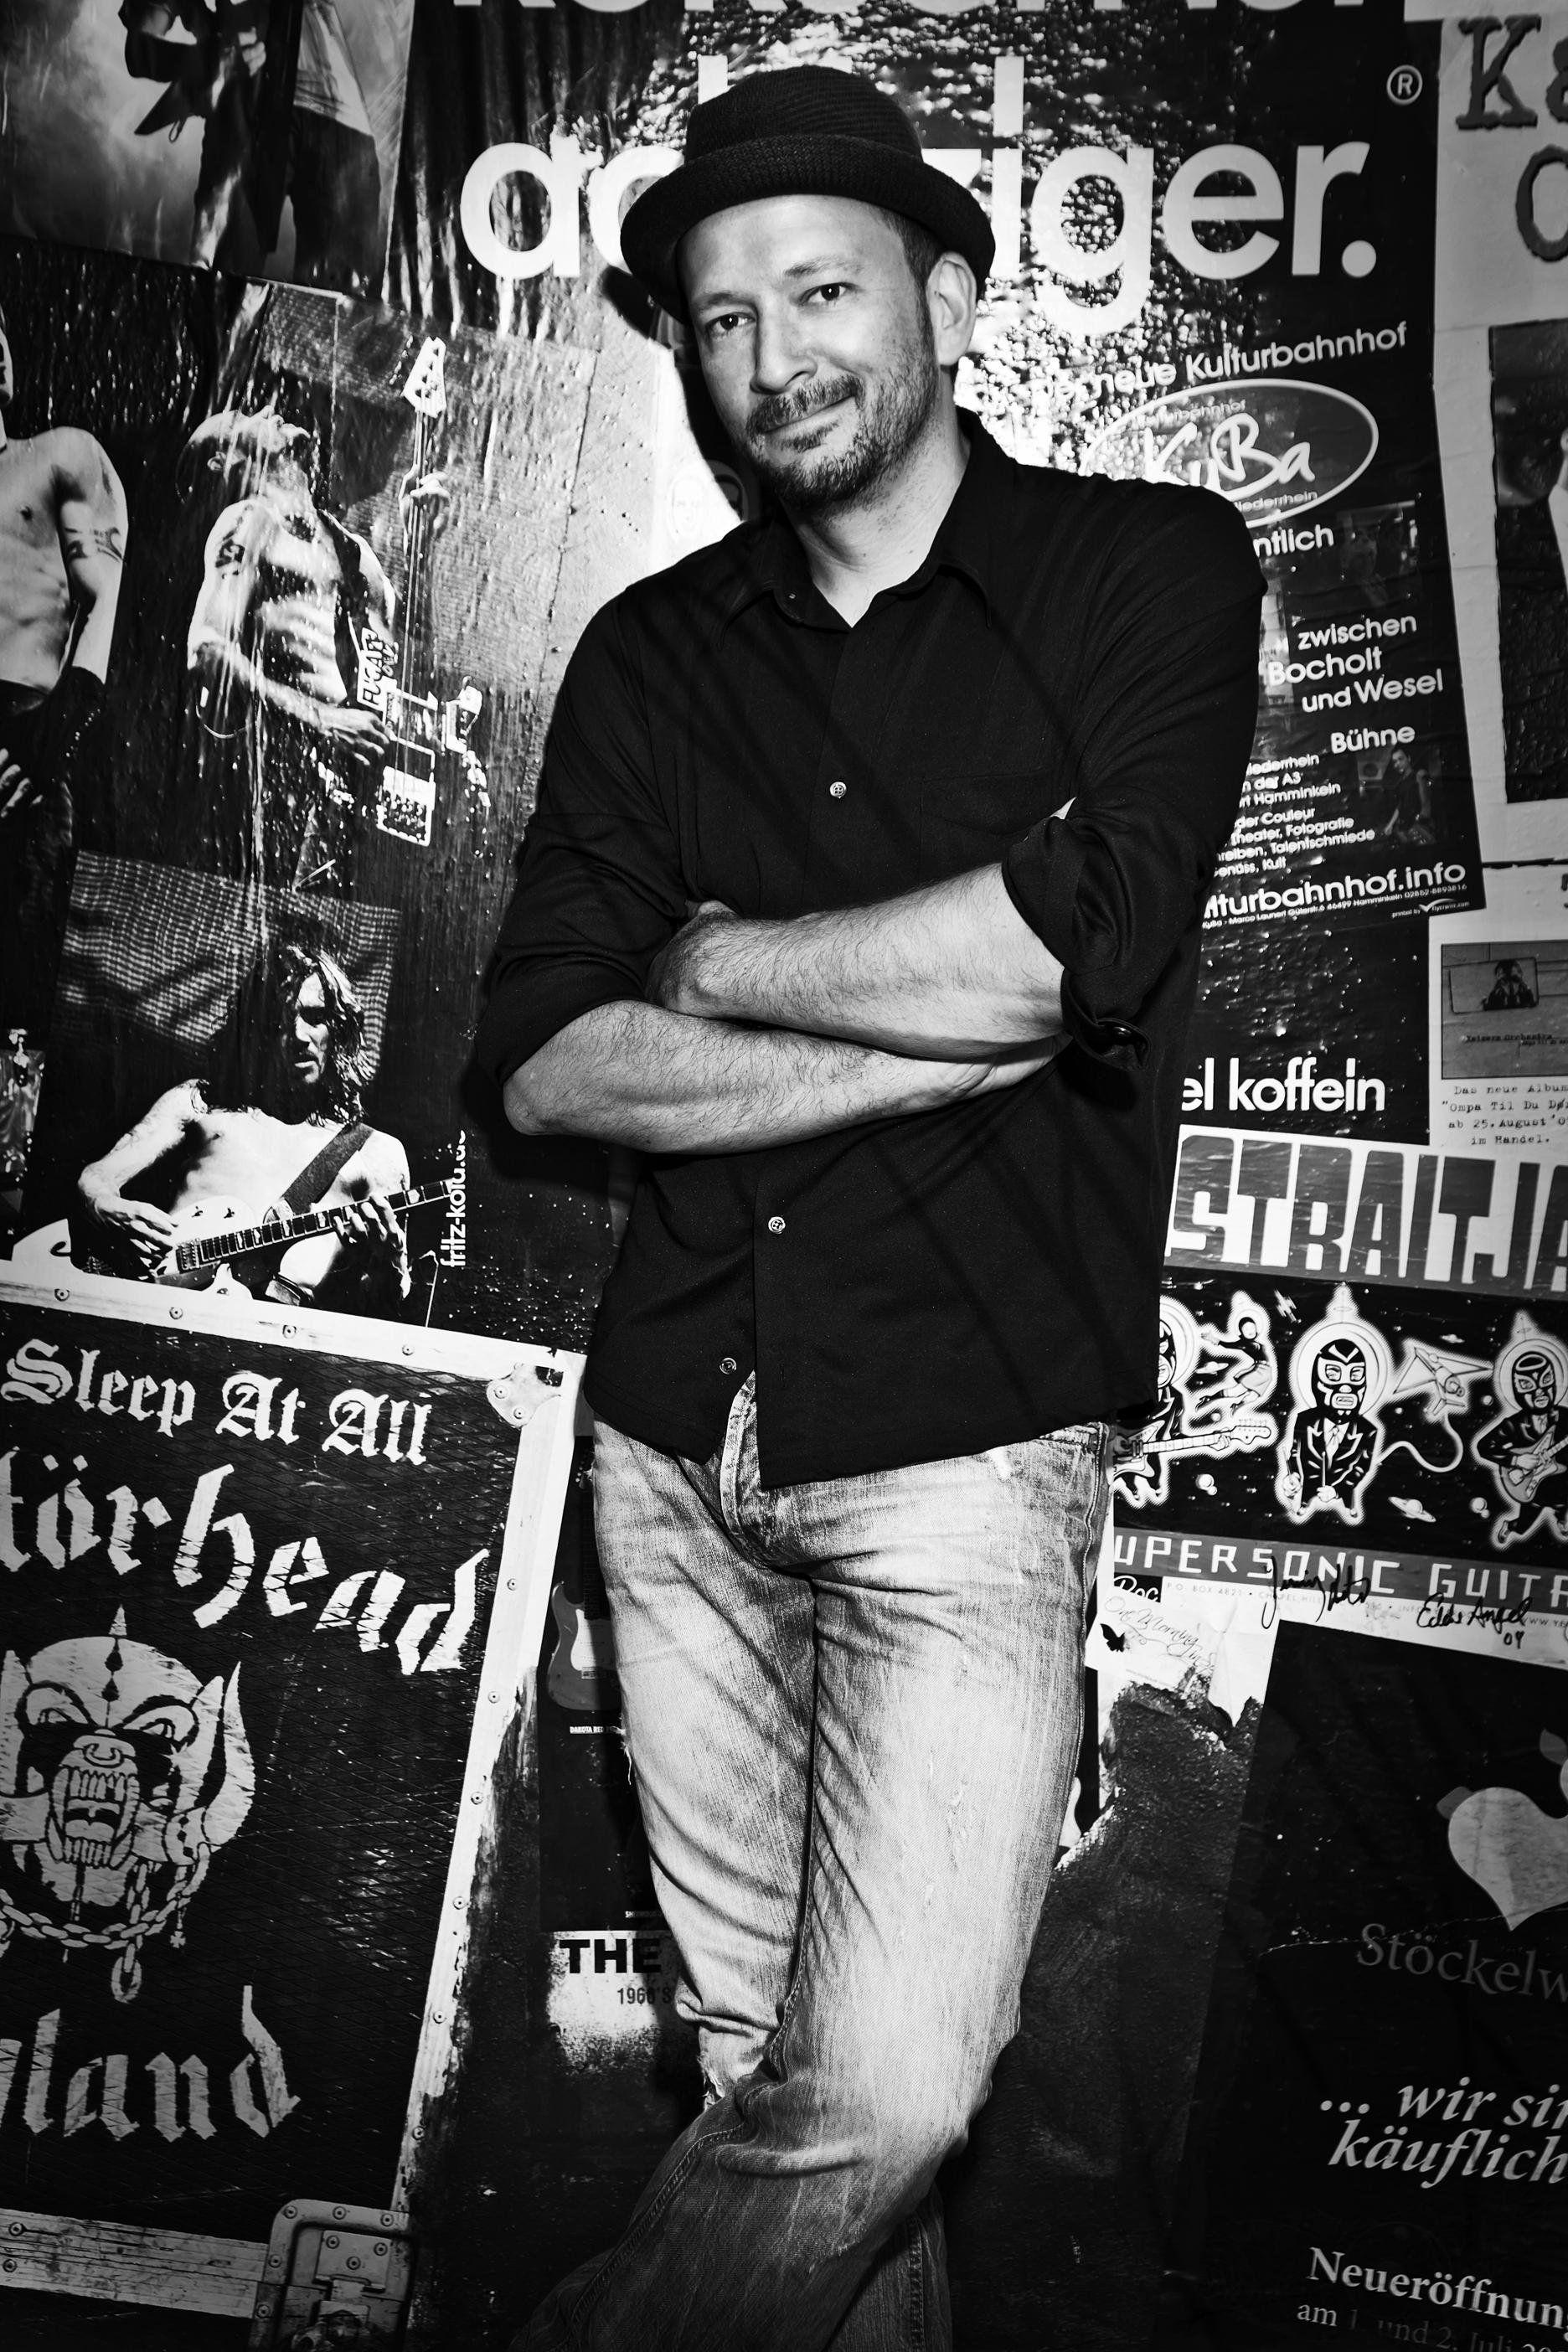 Marco Launert